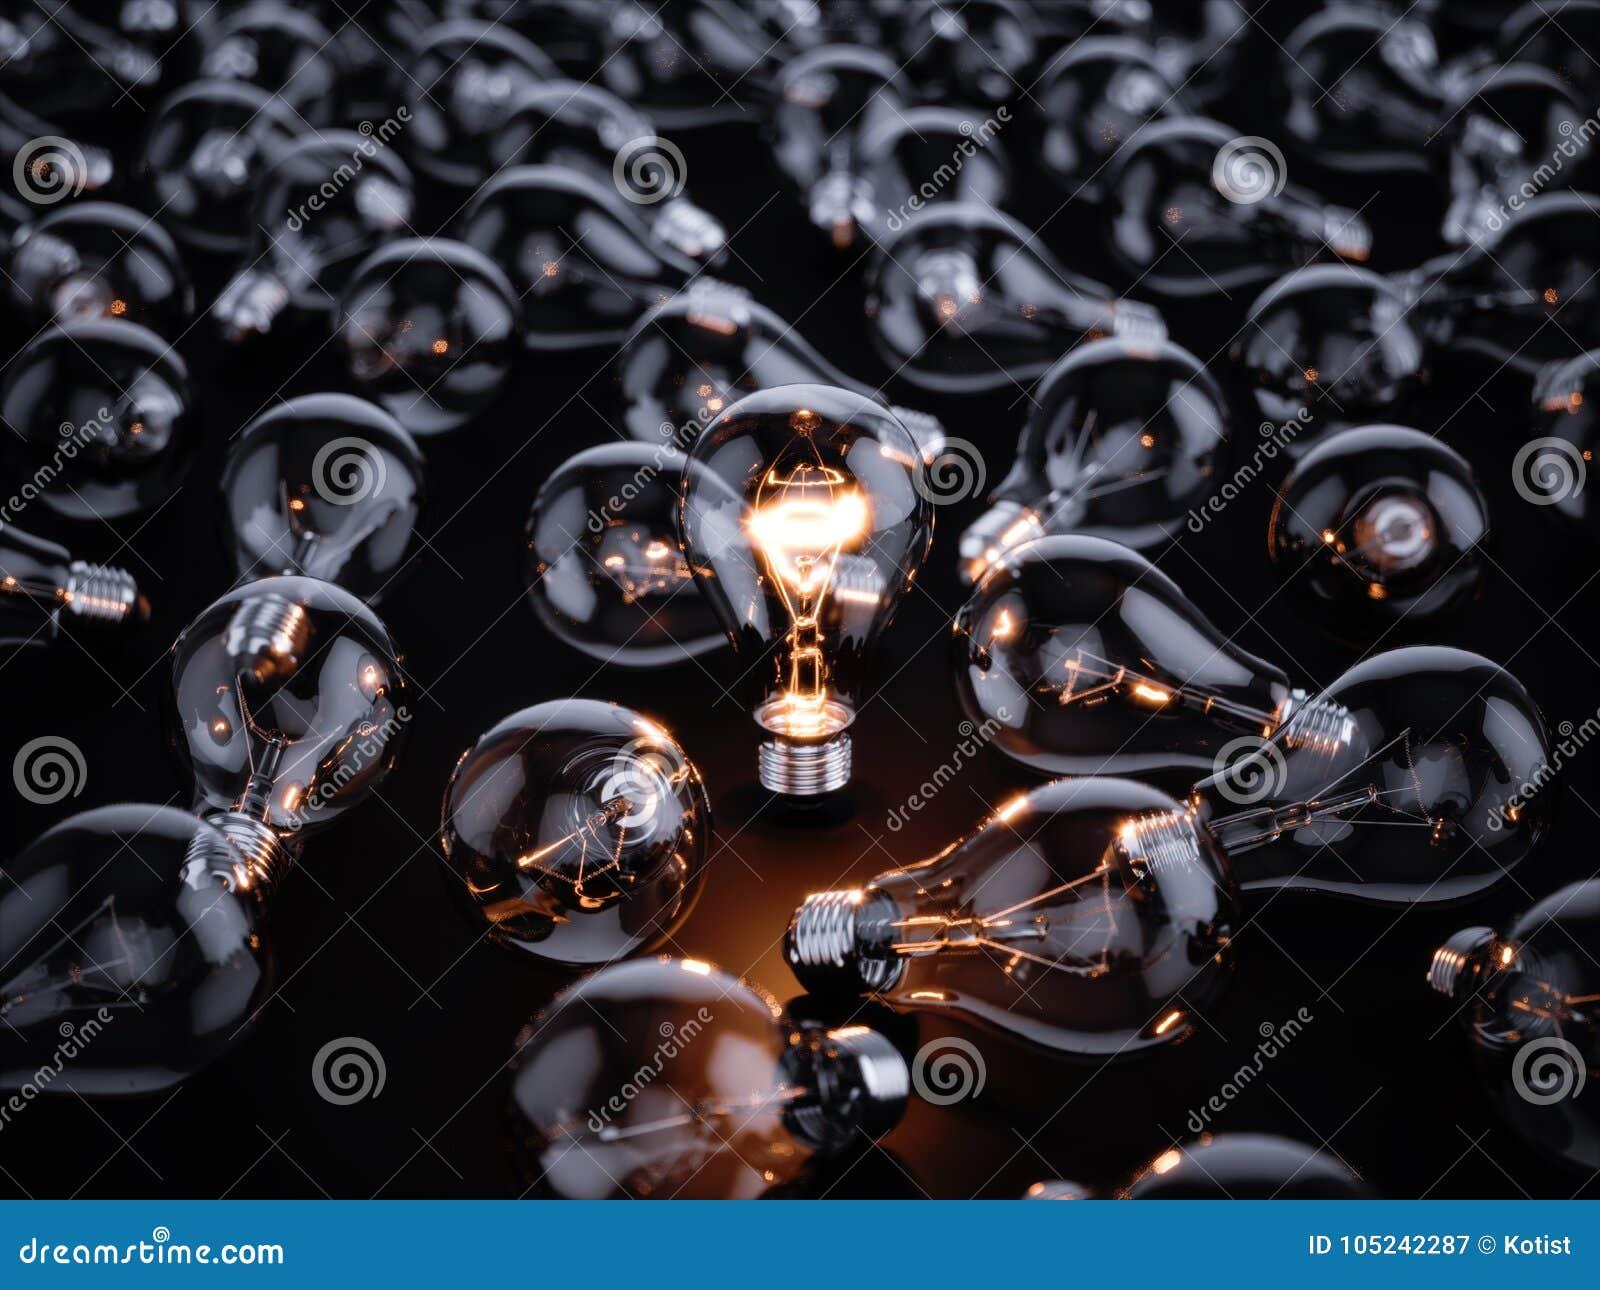 Light bulbs with glowing one